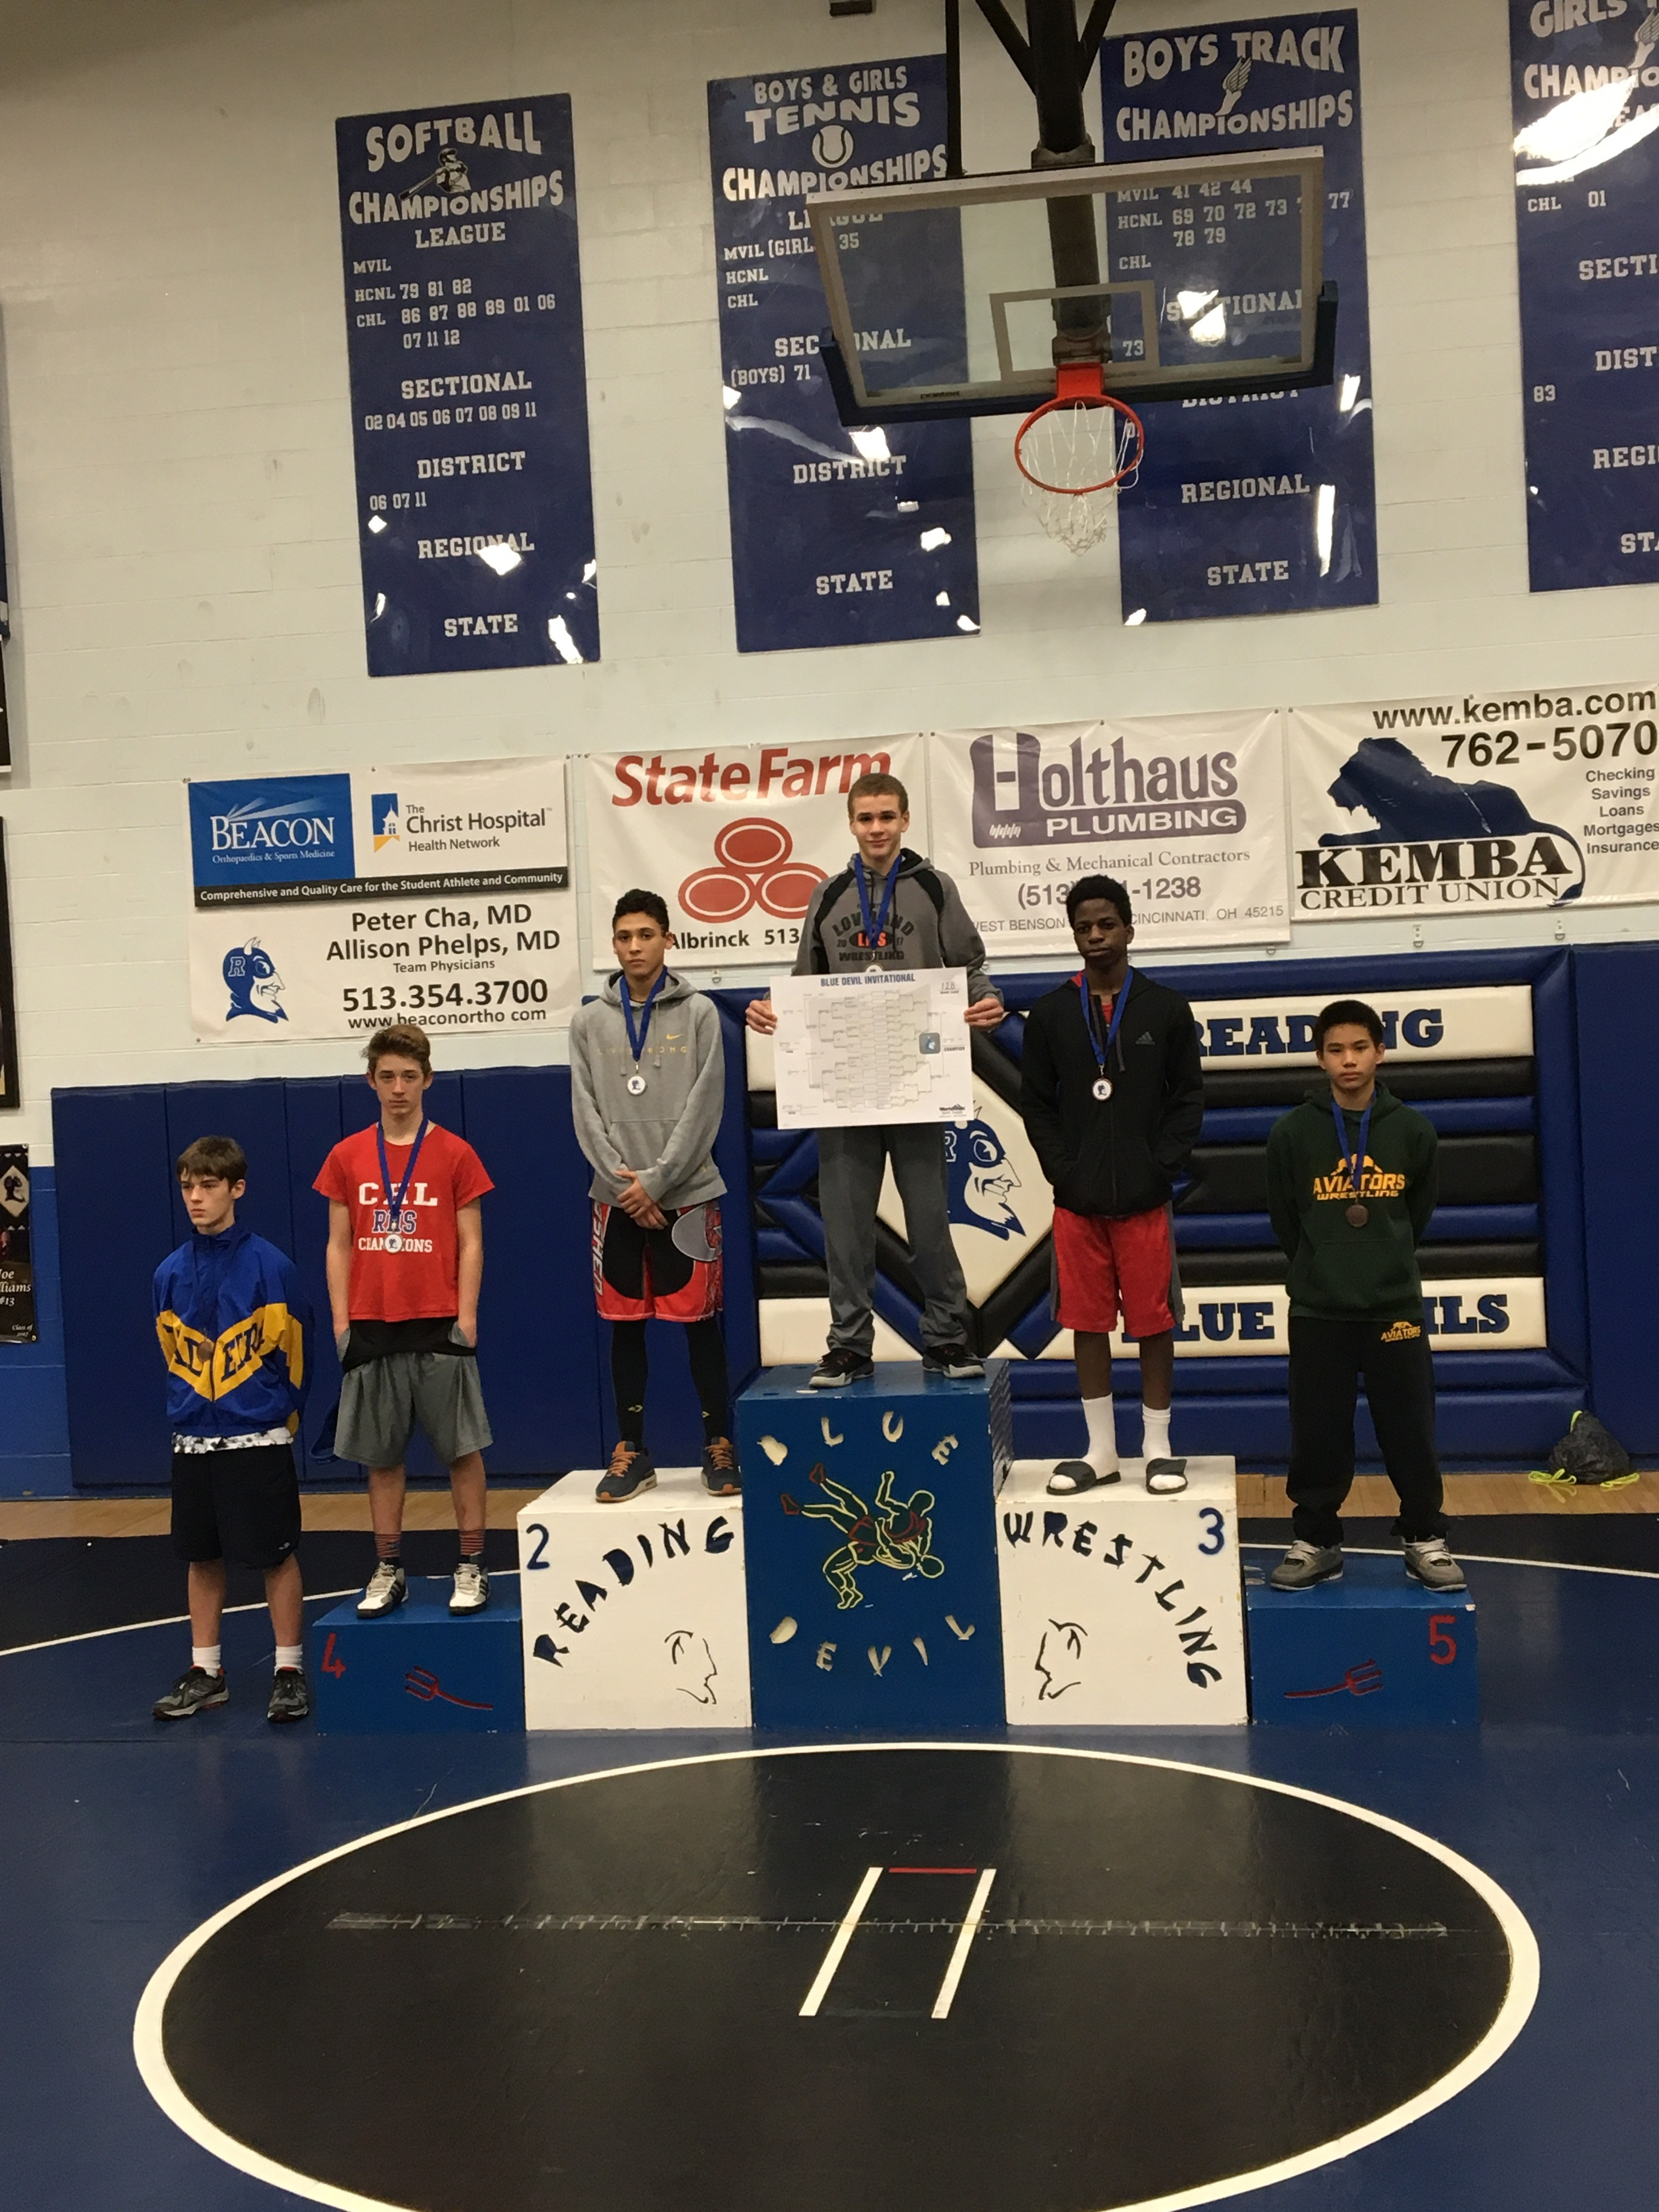 8th grade wrestler Rafeal Farris